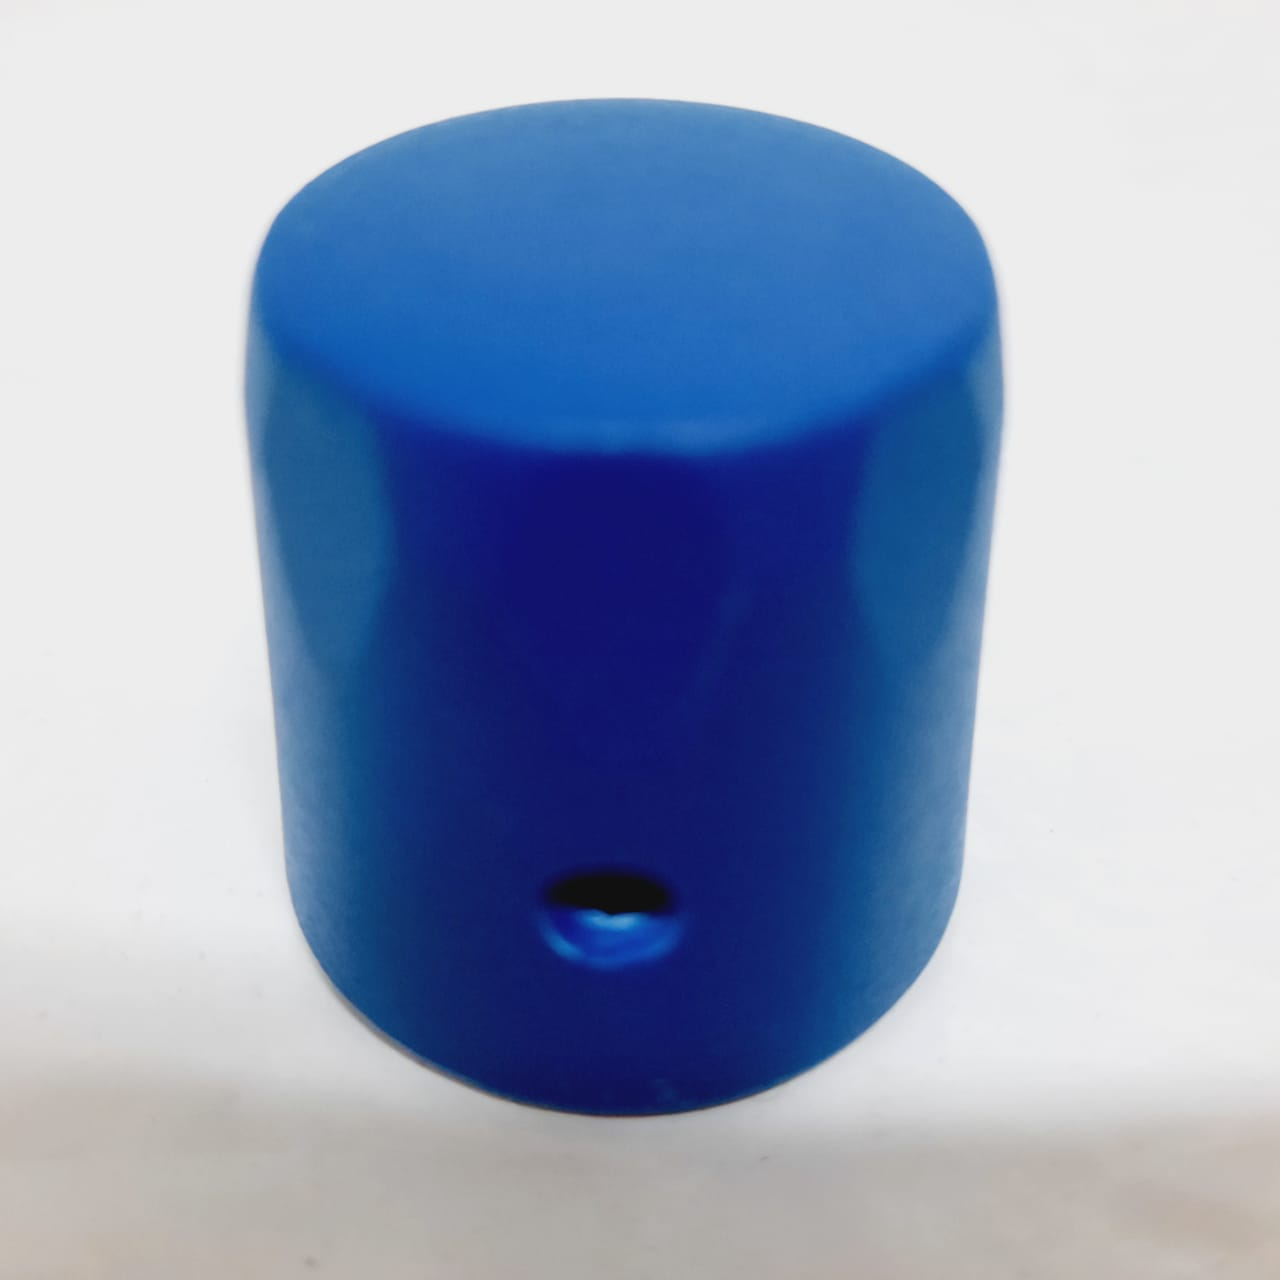 Peso Universal Capa Azul (10UN)